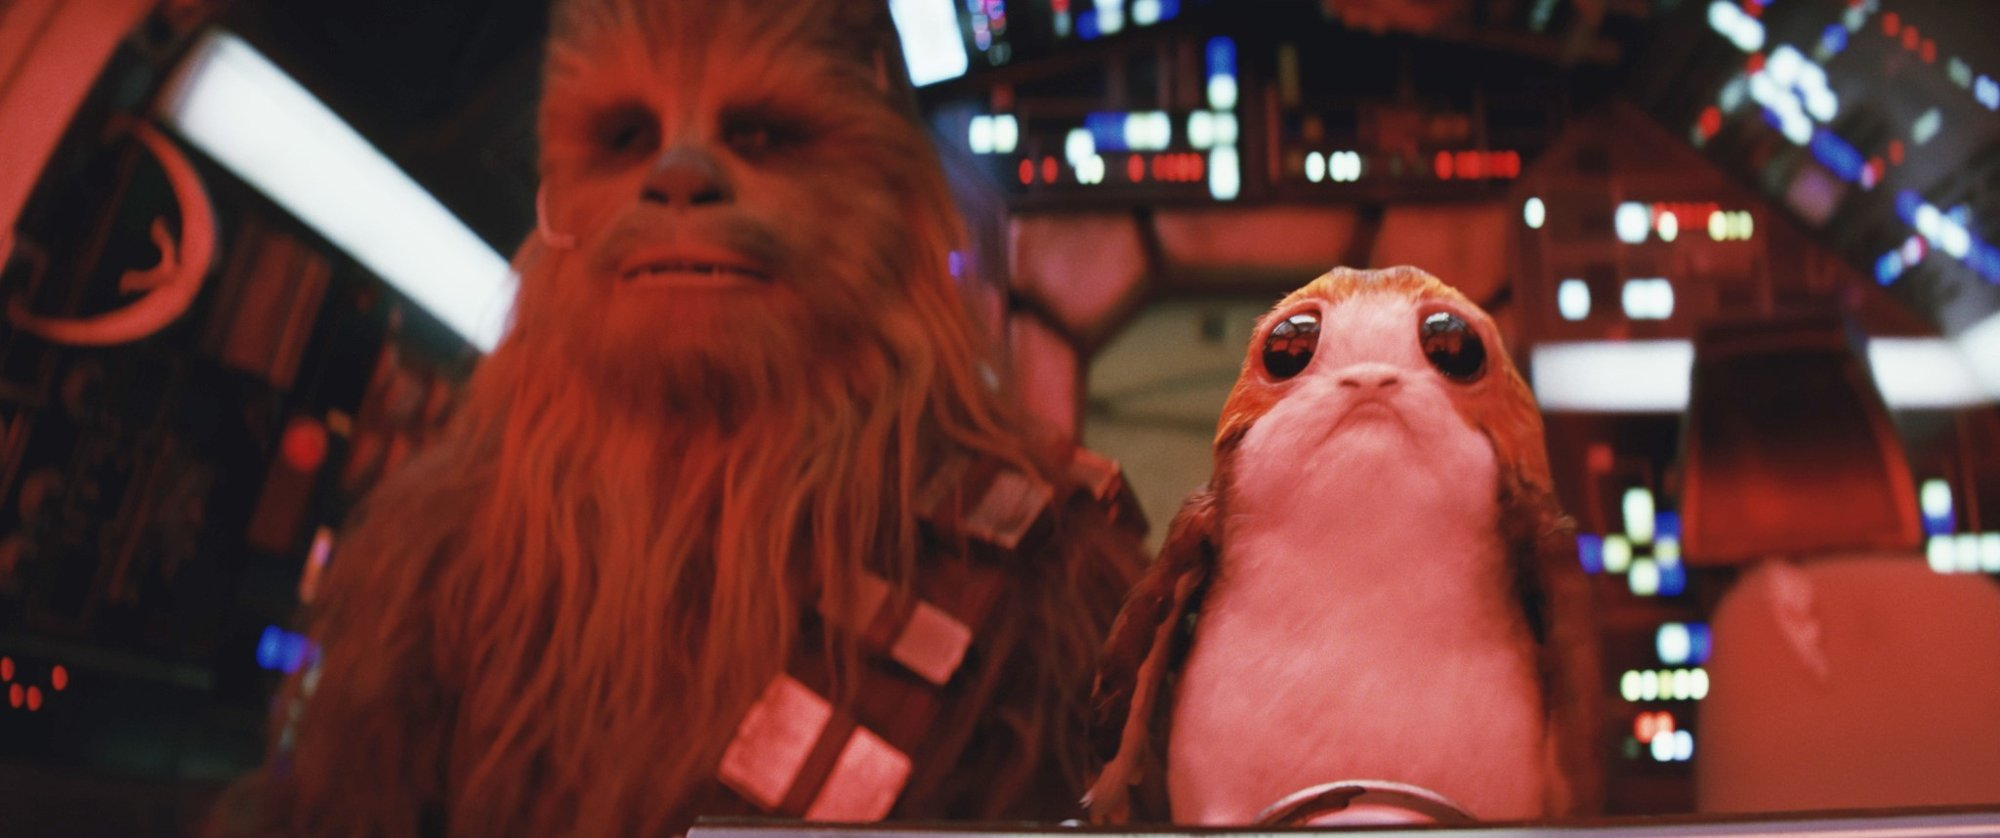 Star Wars Trailer Porgs.jpg